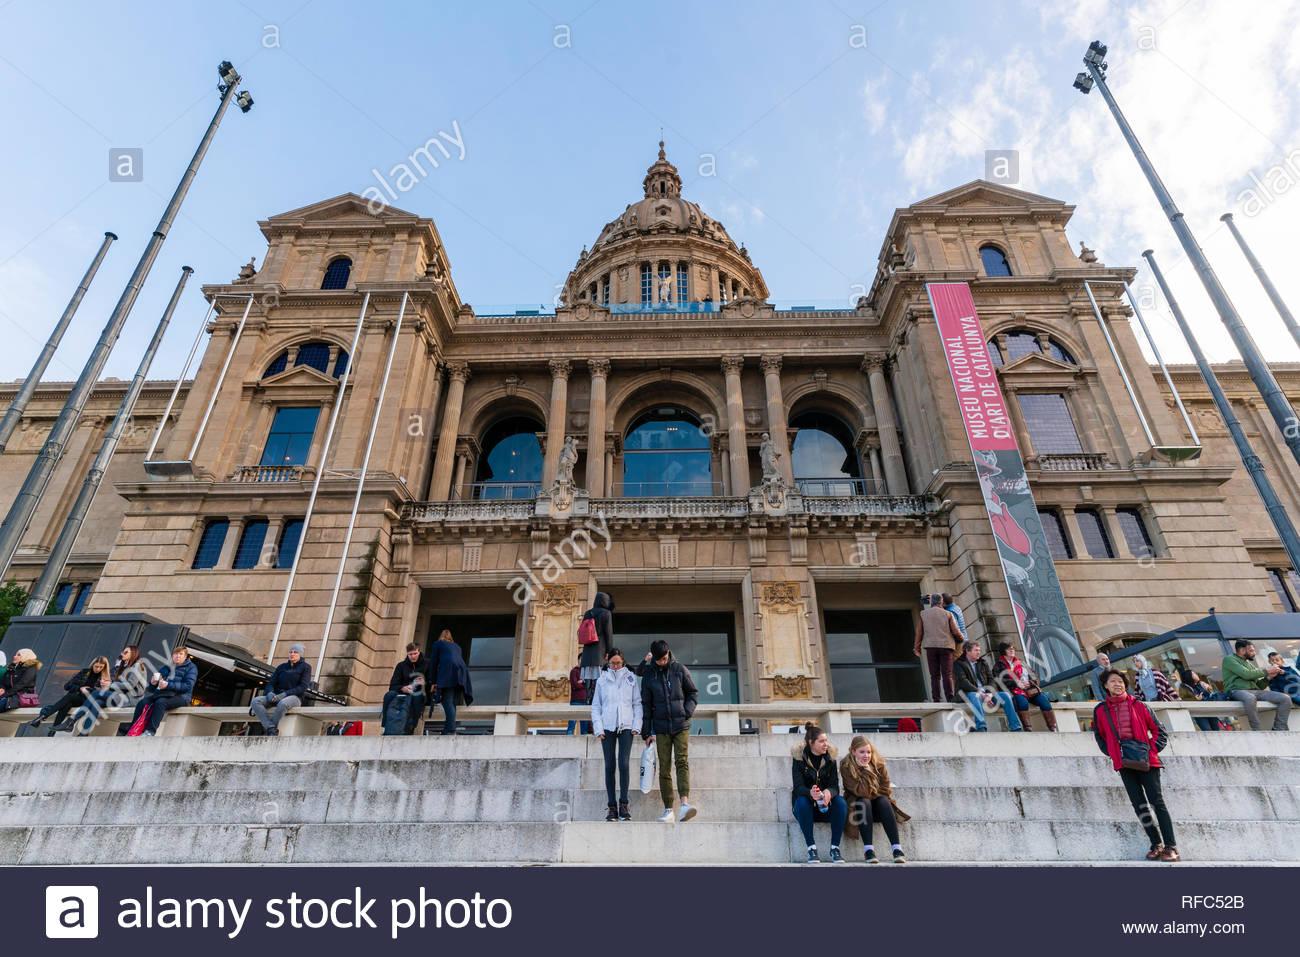 Museu Nacional d'Art de Catalunya (The art History museum) in Barcelona during winter, Spain Stock Photo